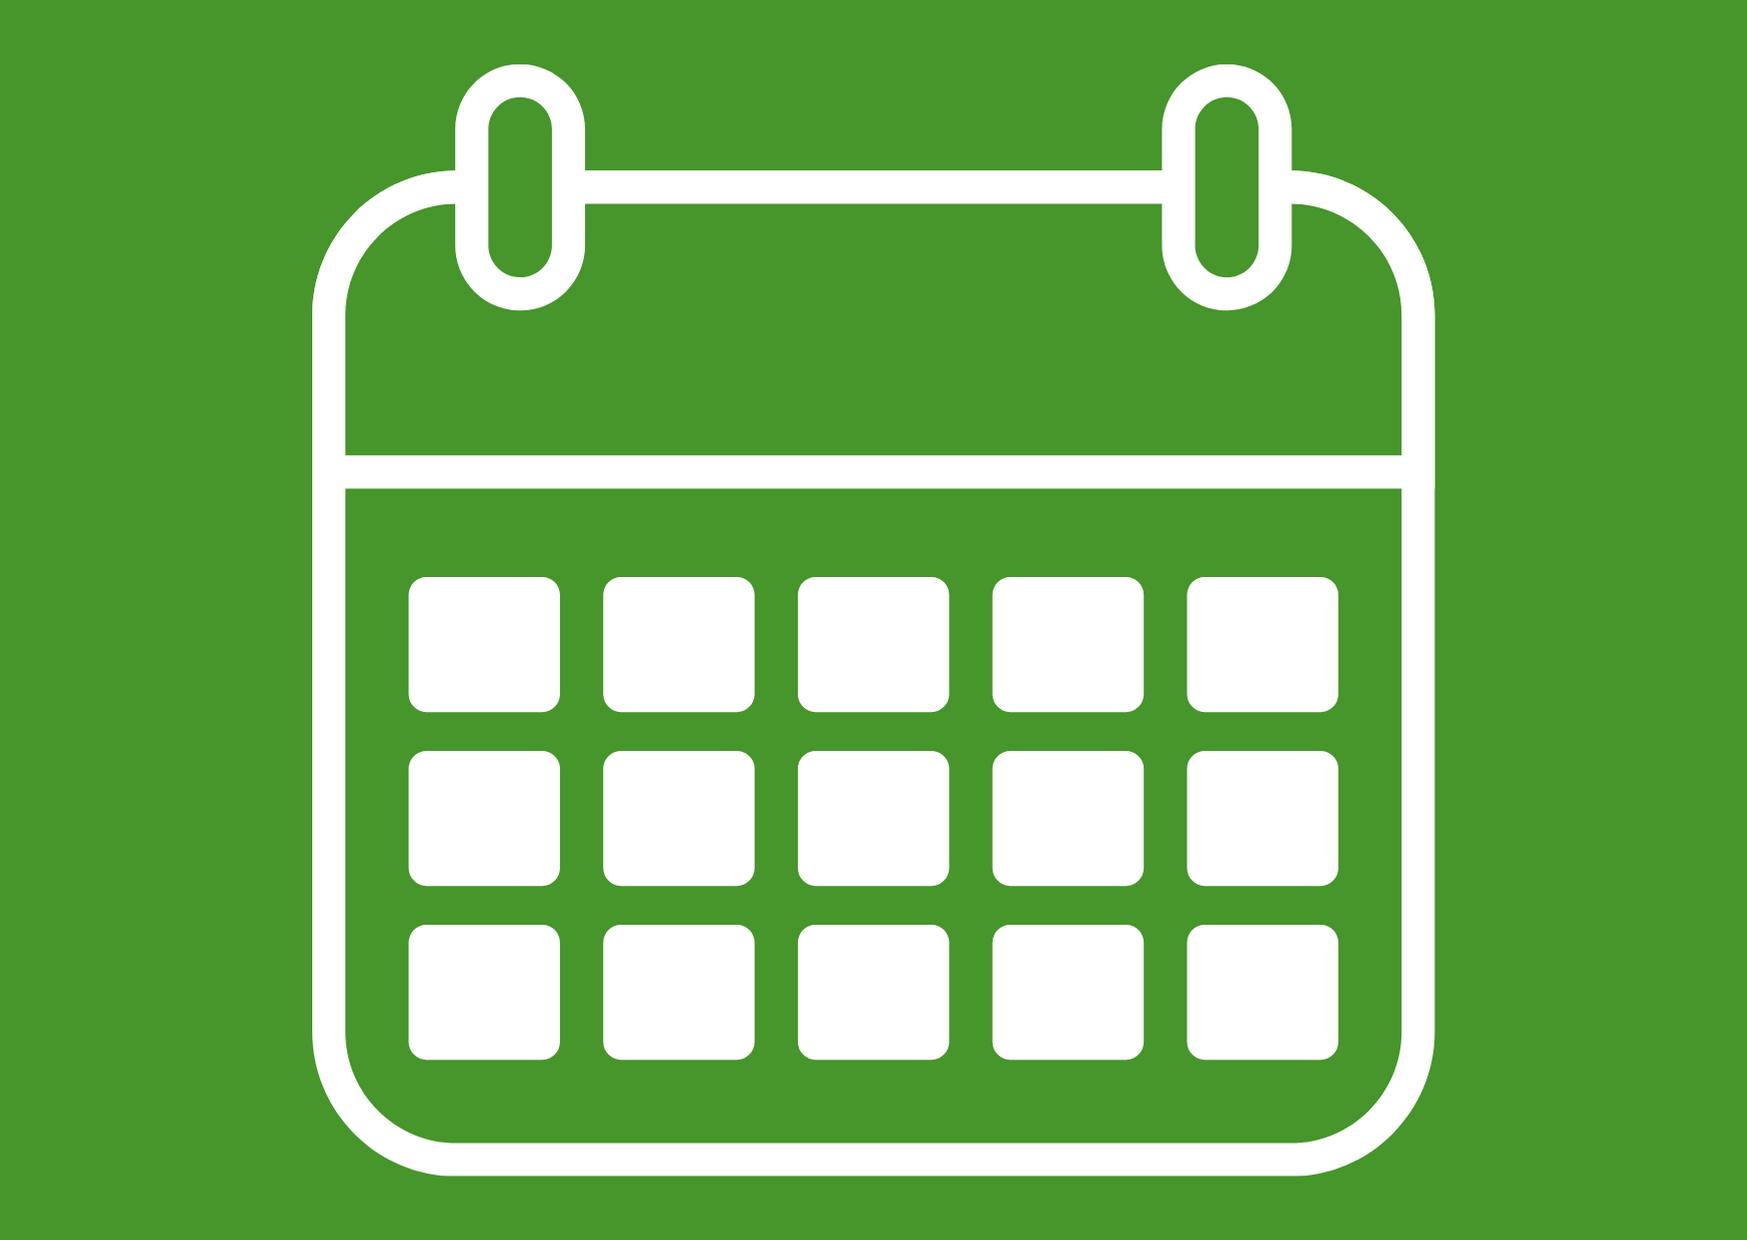 Kalender_grün